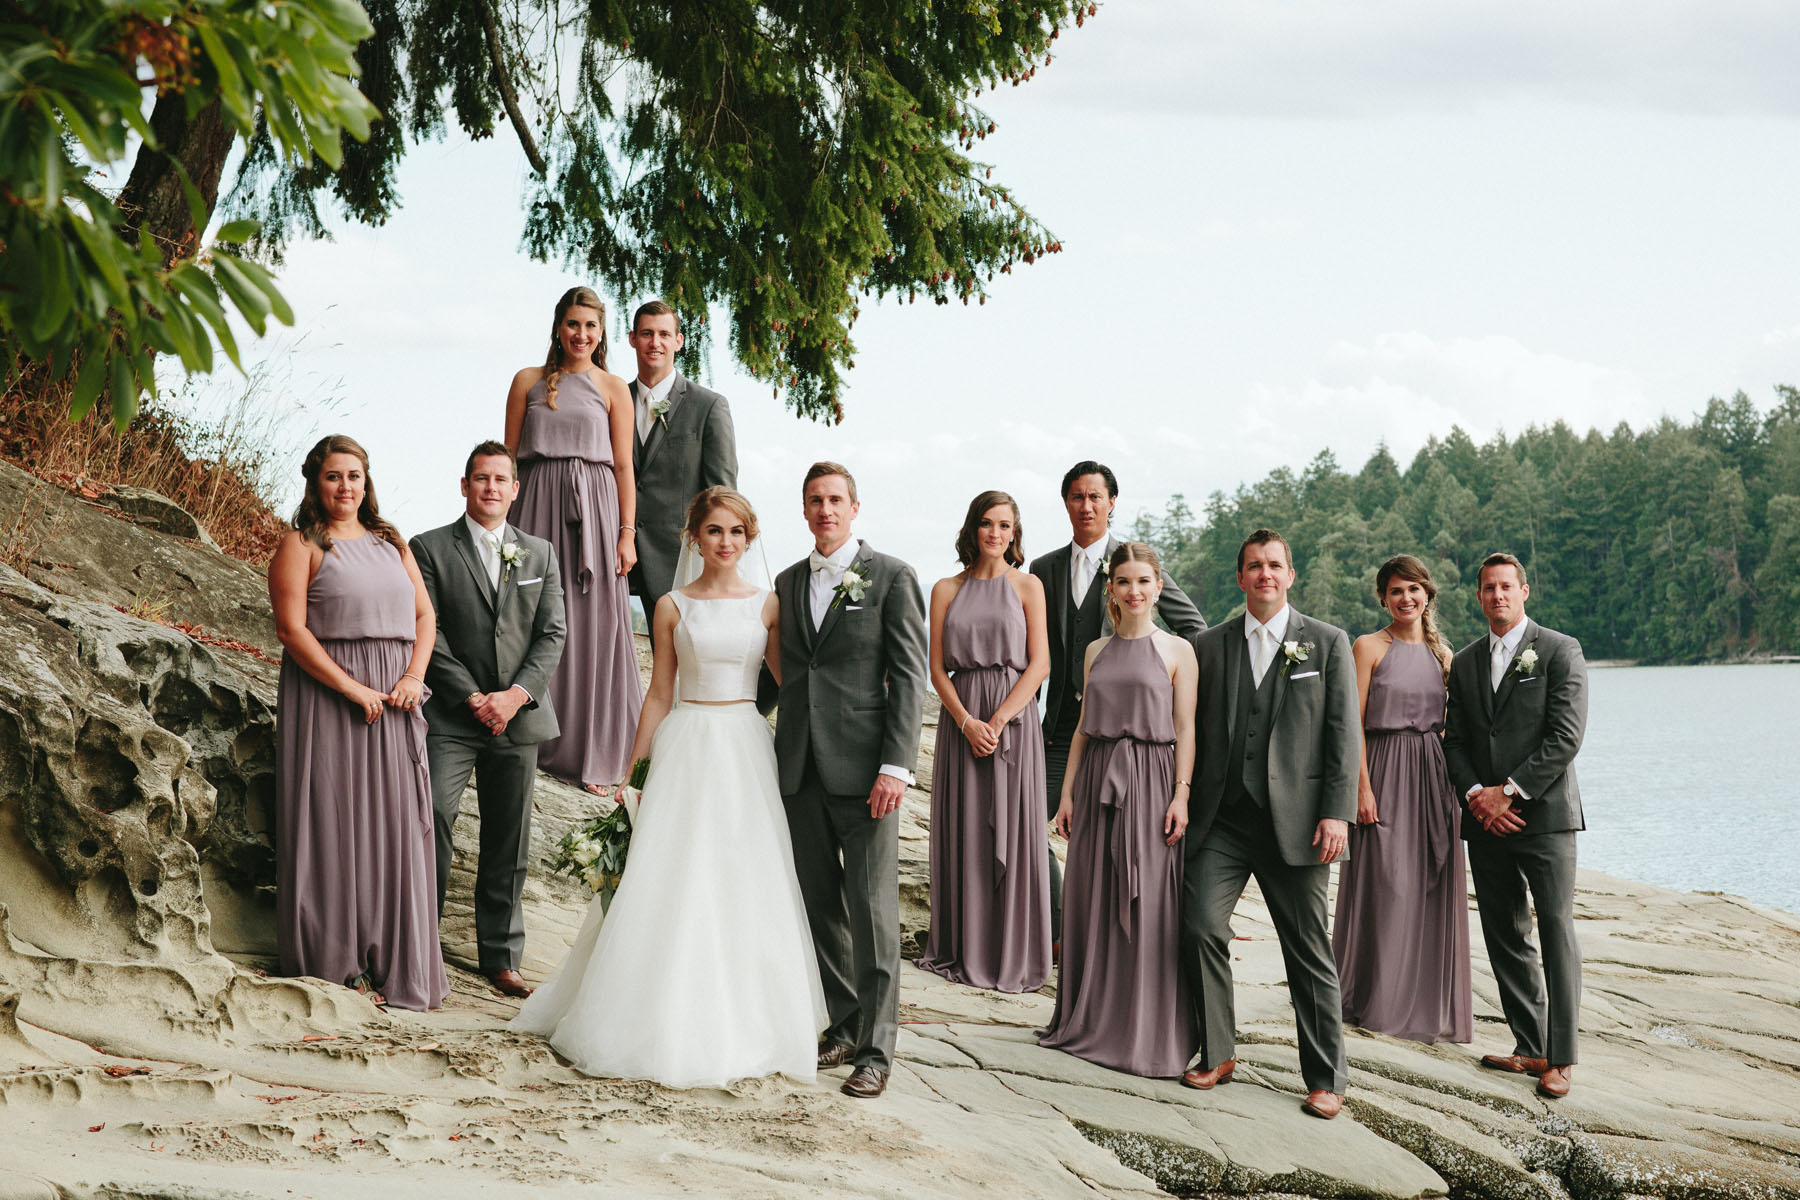 thetis-island-wedding-photographer-rp-rn-113.jpg